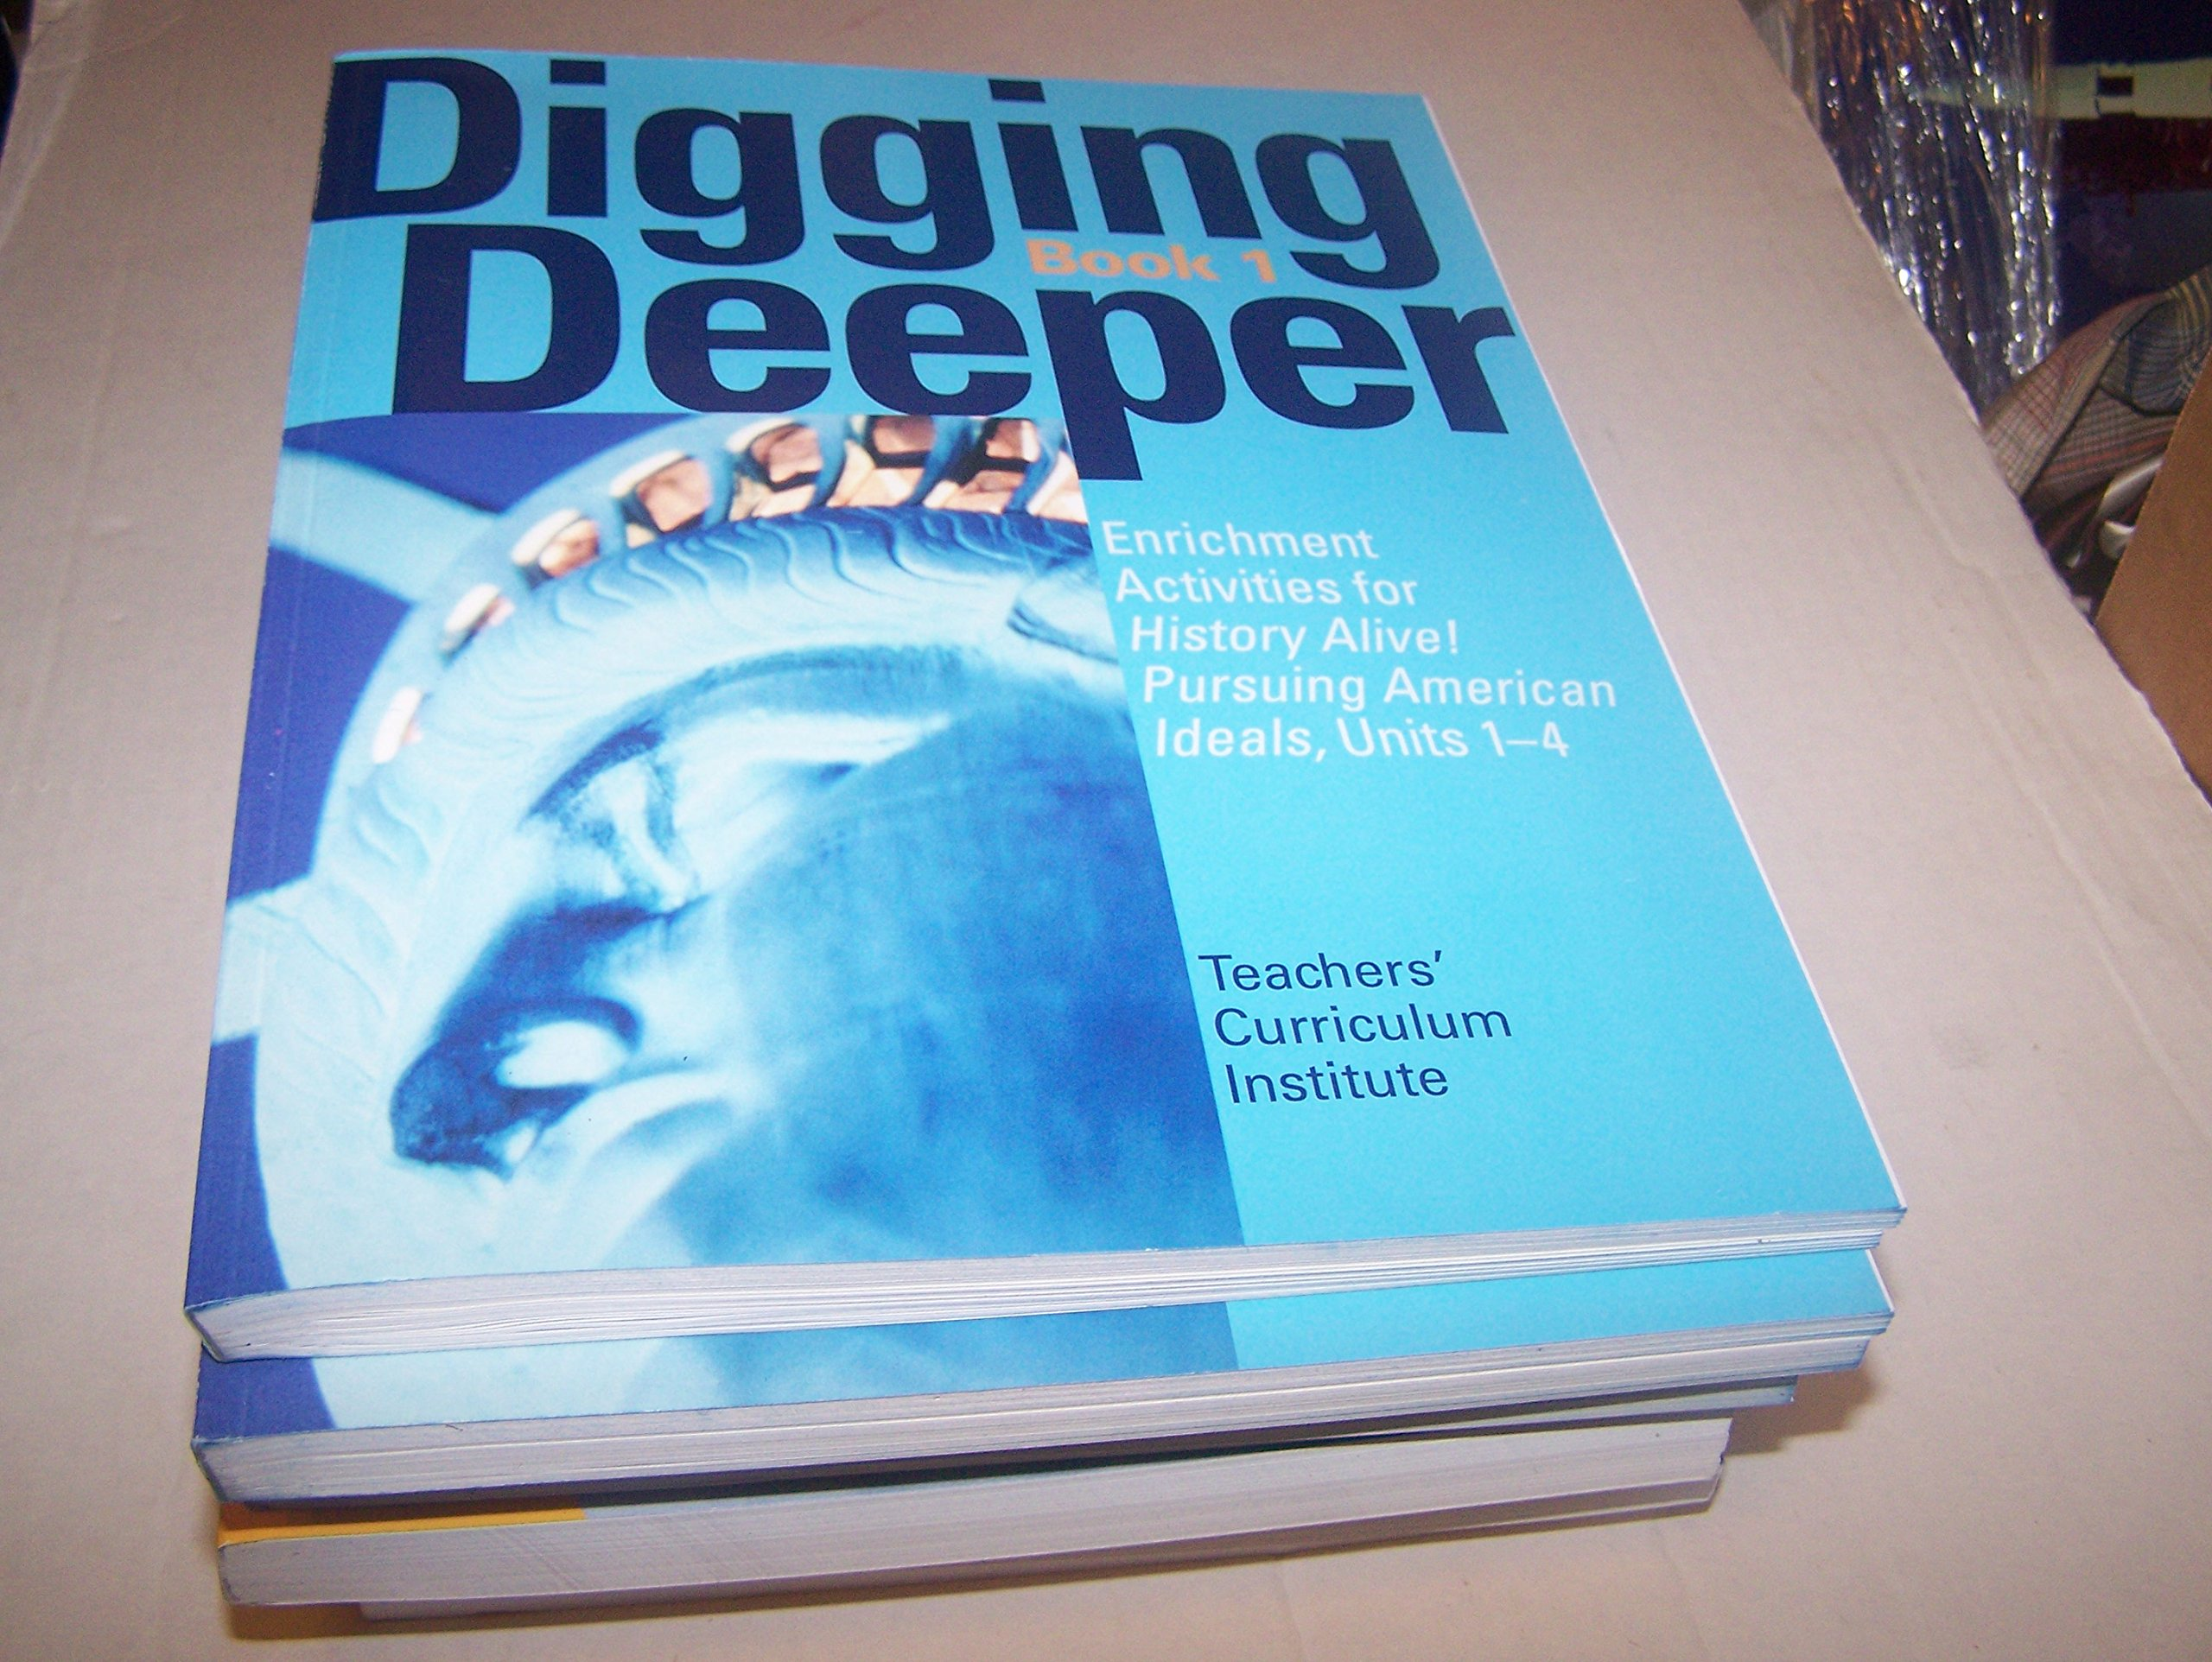 Download Digging Deeper Book 1 (Enrichment Activities for History Alive! Pursuing American Ideals, Units 1-4) pdf epub